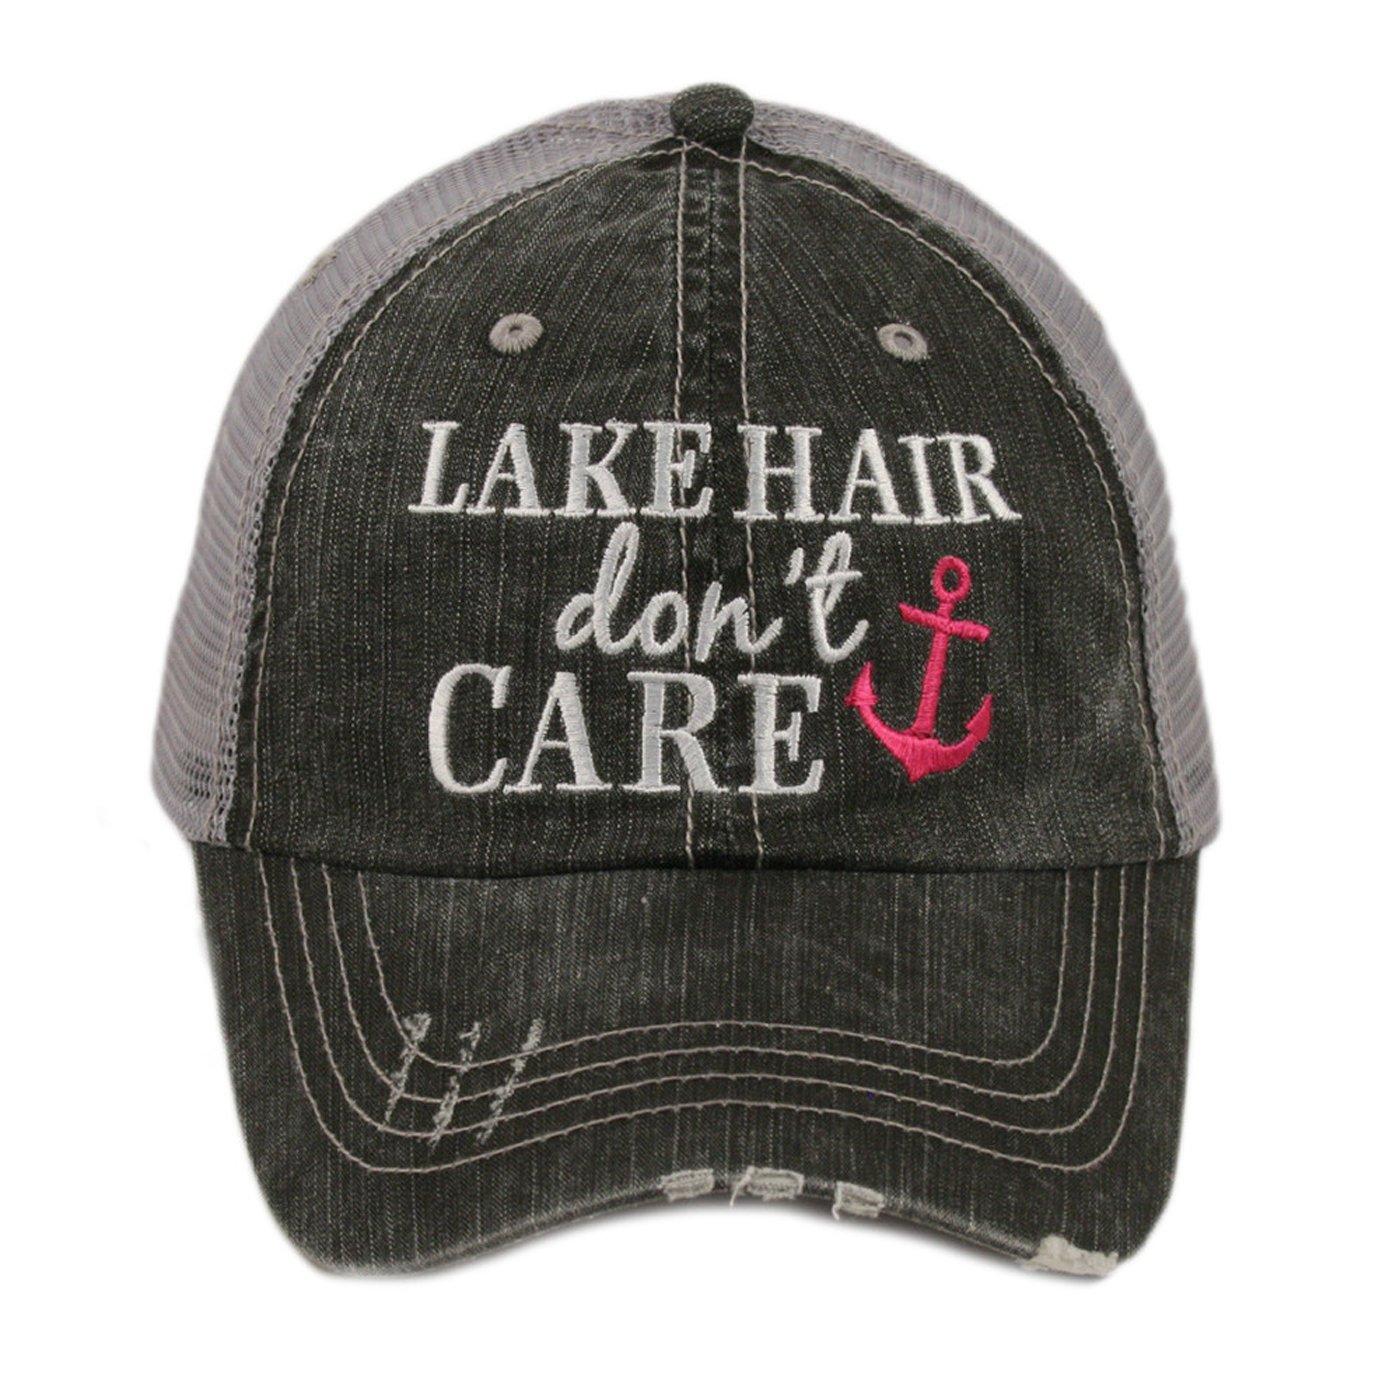 KATYDID Lake Hair Don't Care Women's Distressed Trucker Hat